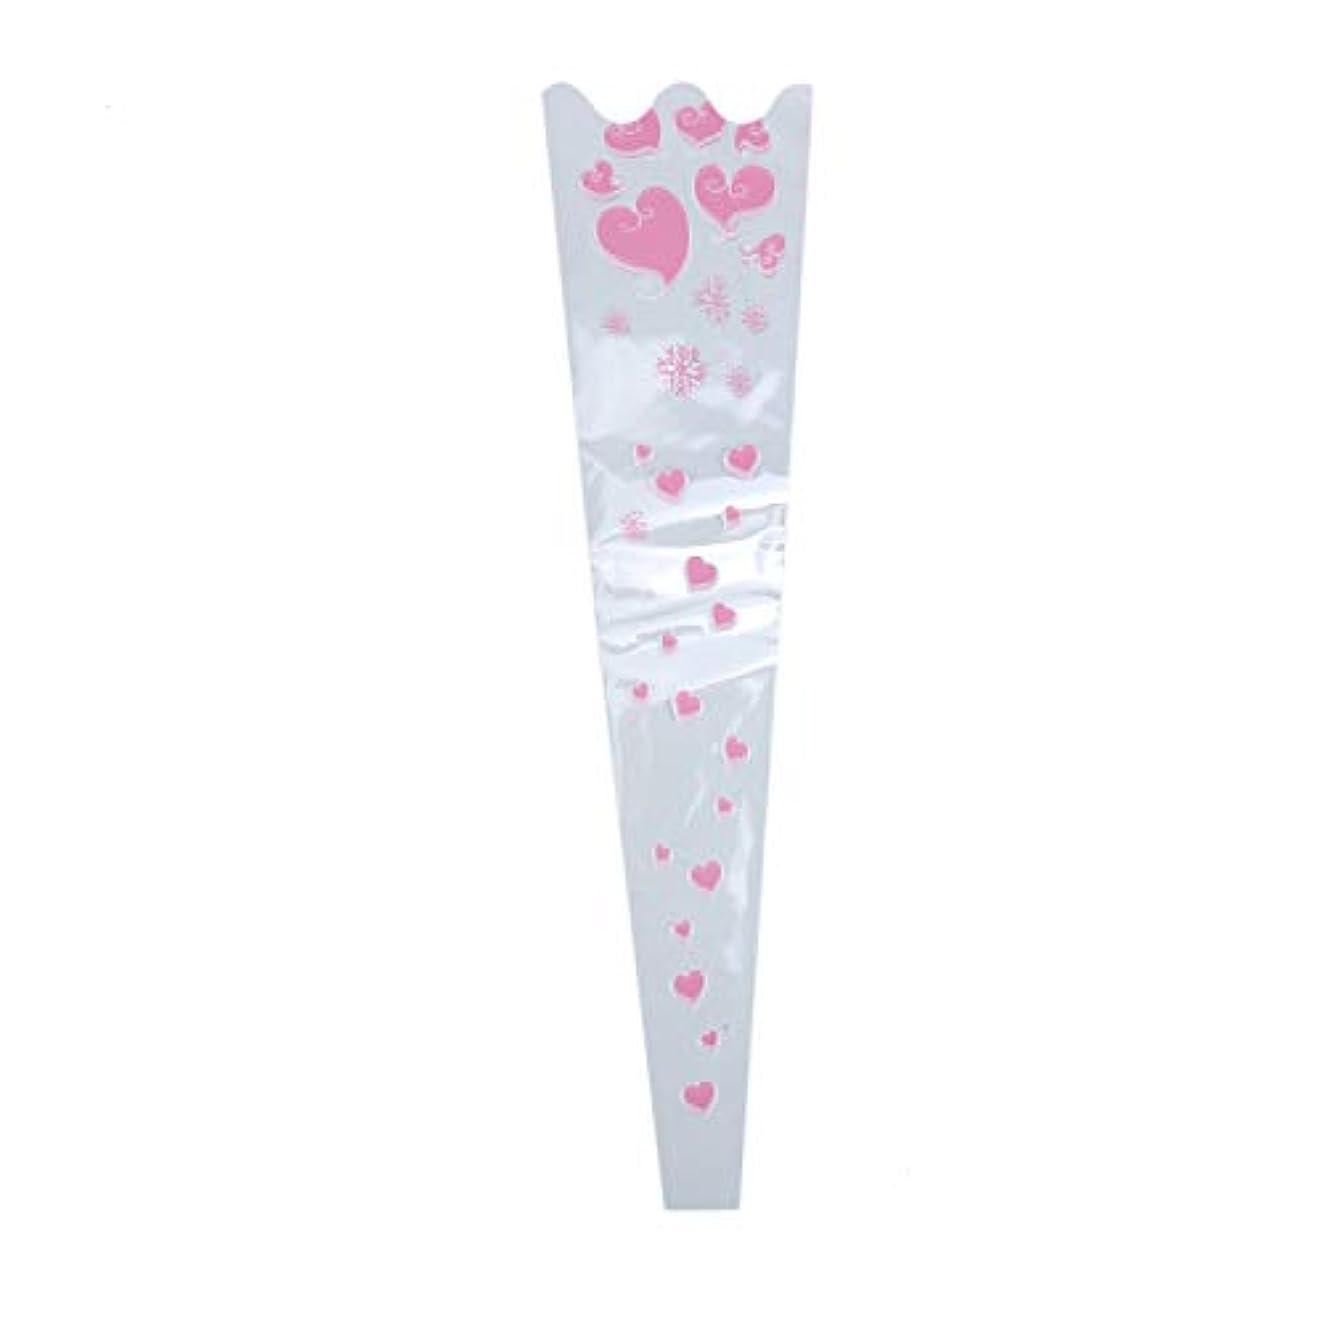 Monrocco 200 Pcs Pink Heart Flower Gift Bag Single Rose Packaging Bags